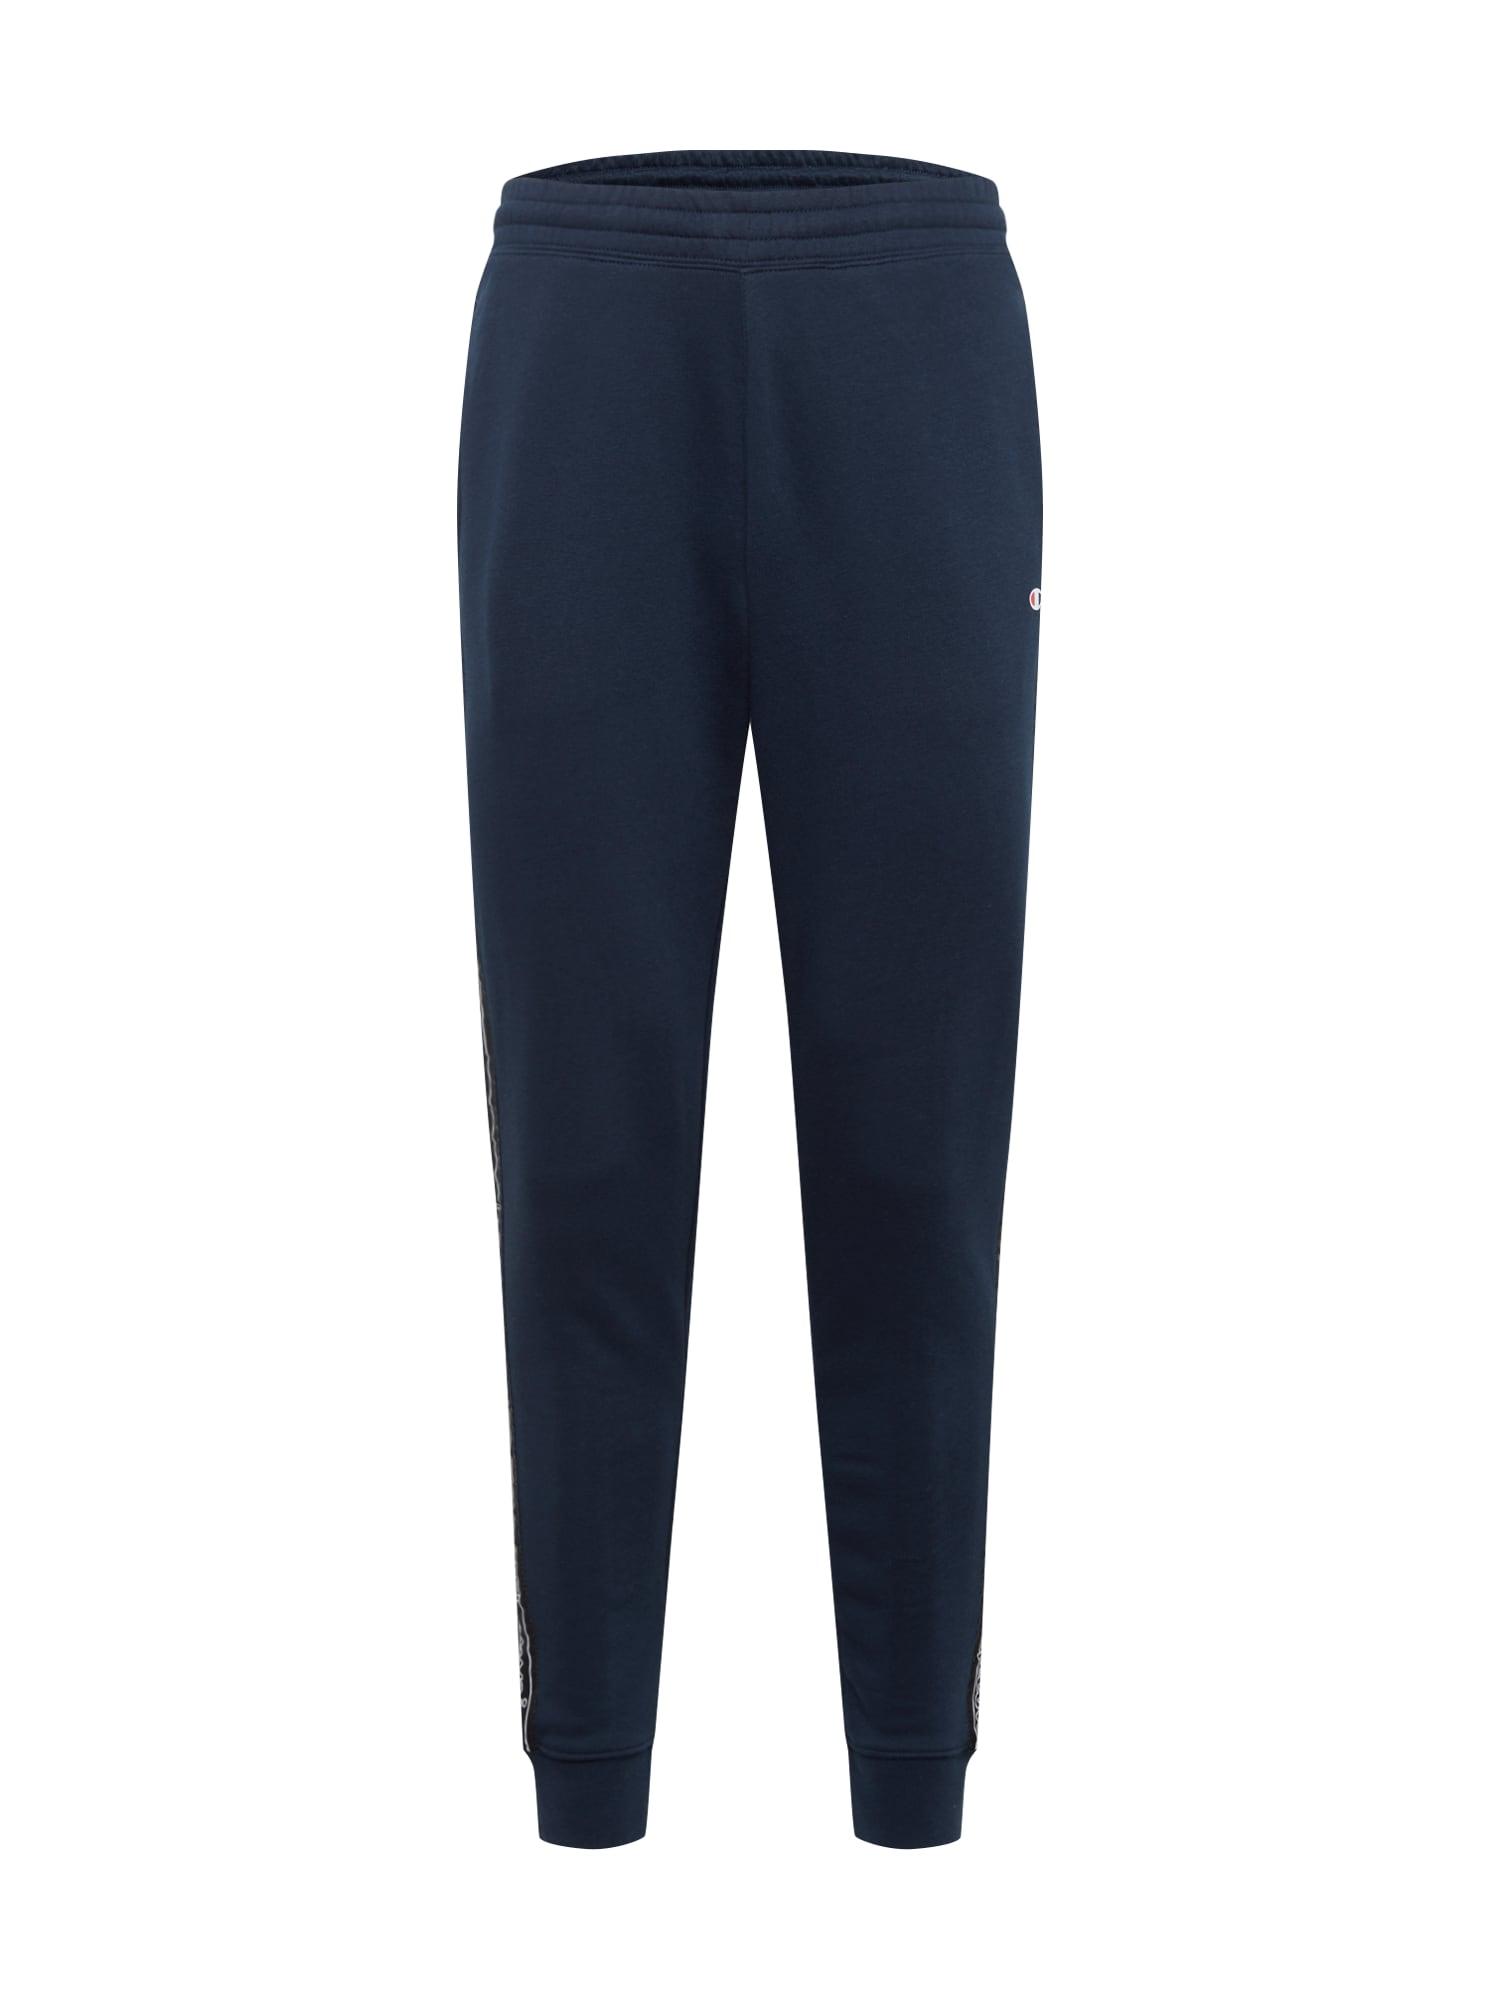 Champion Authentic Athletic Apparel Kelnės tamsiai mėlyna / juoda / balta